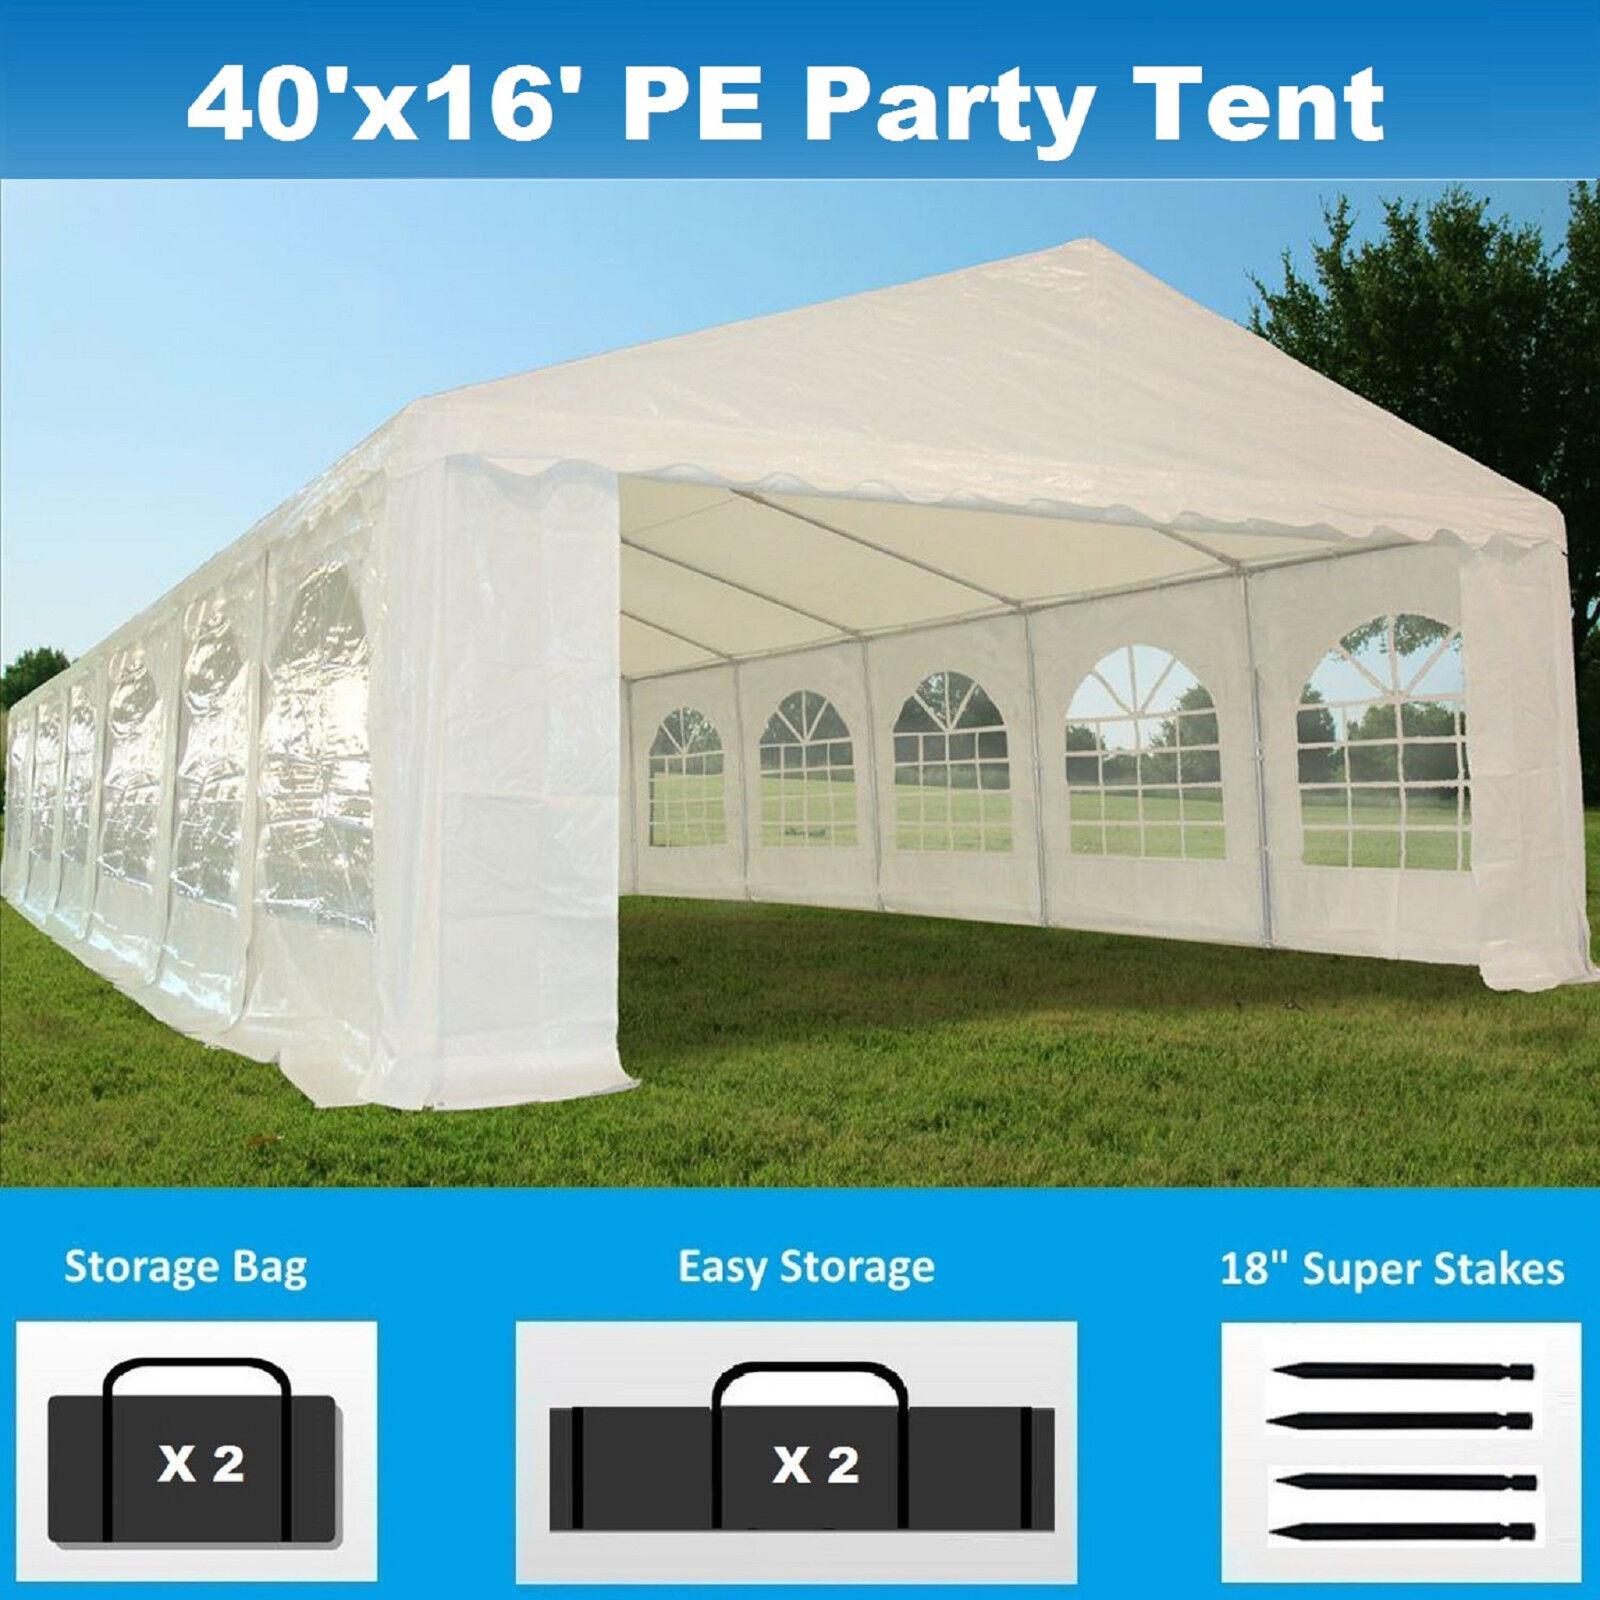 40' x 16' PE Party Tent - Heavy Duty Carport Canopy Wedding